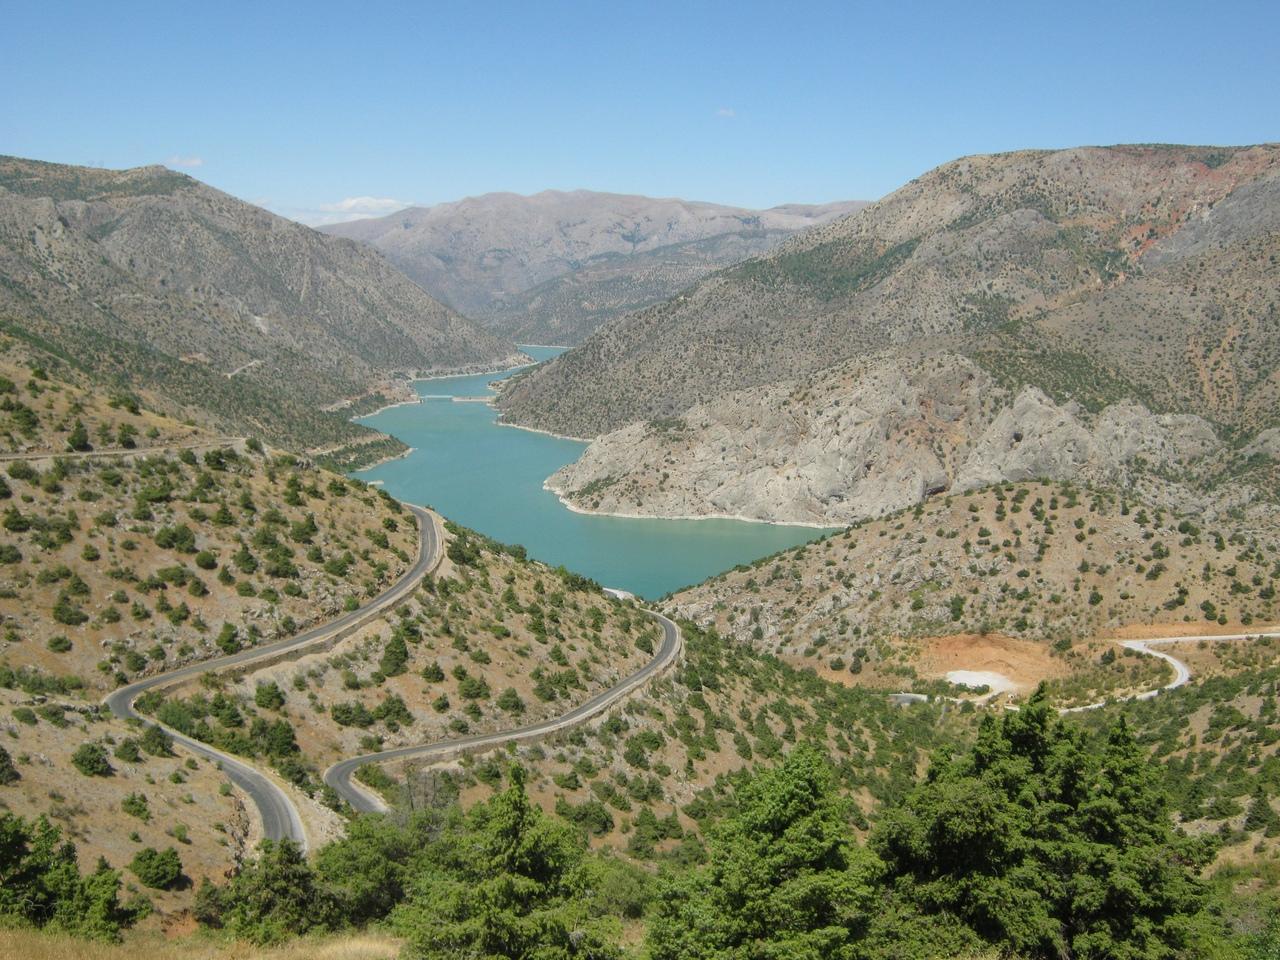 Красивое водохранилище на реке Евфрат